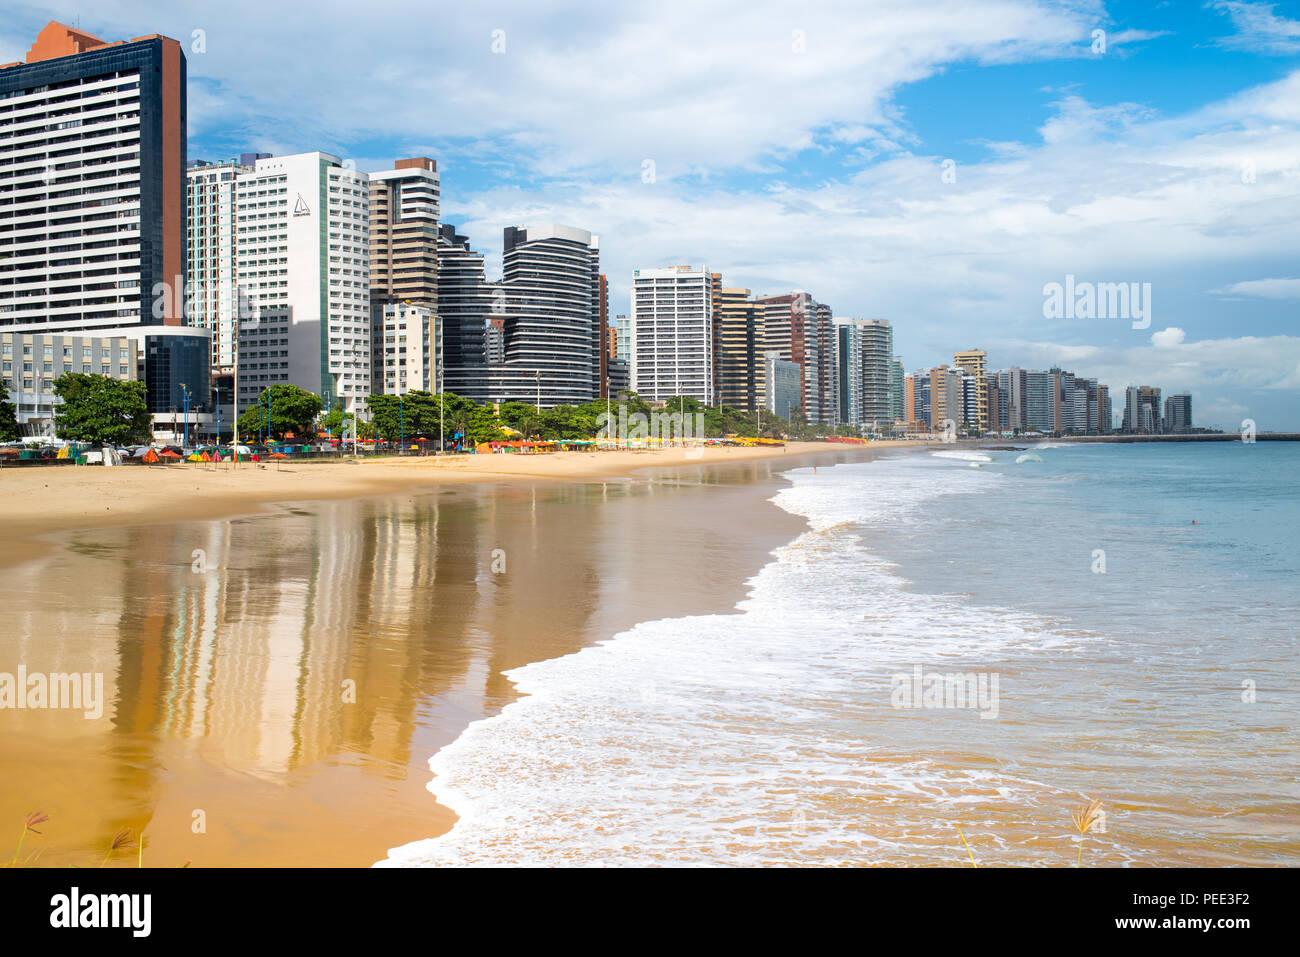 FORTALEZA, BRAZIL - MARCH 1, 2018: Coast Line of Fortaleza, Ceara State, city of northeast of Brazil . Stock Photo